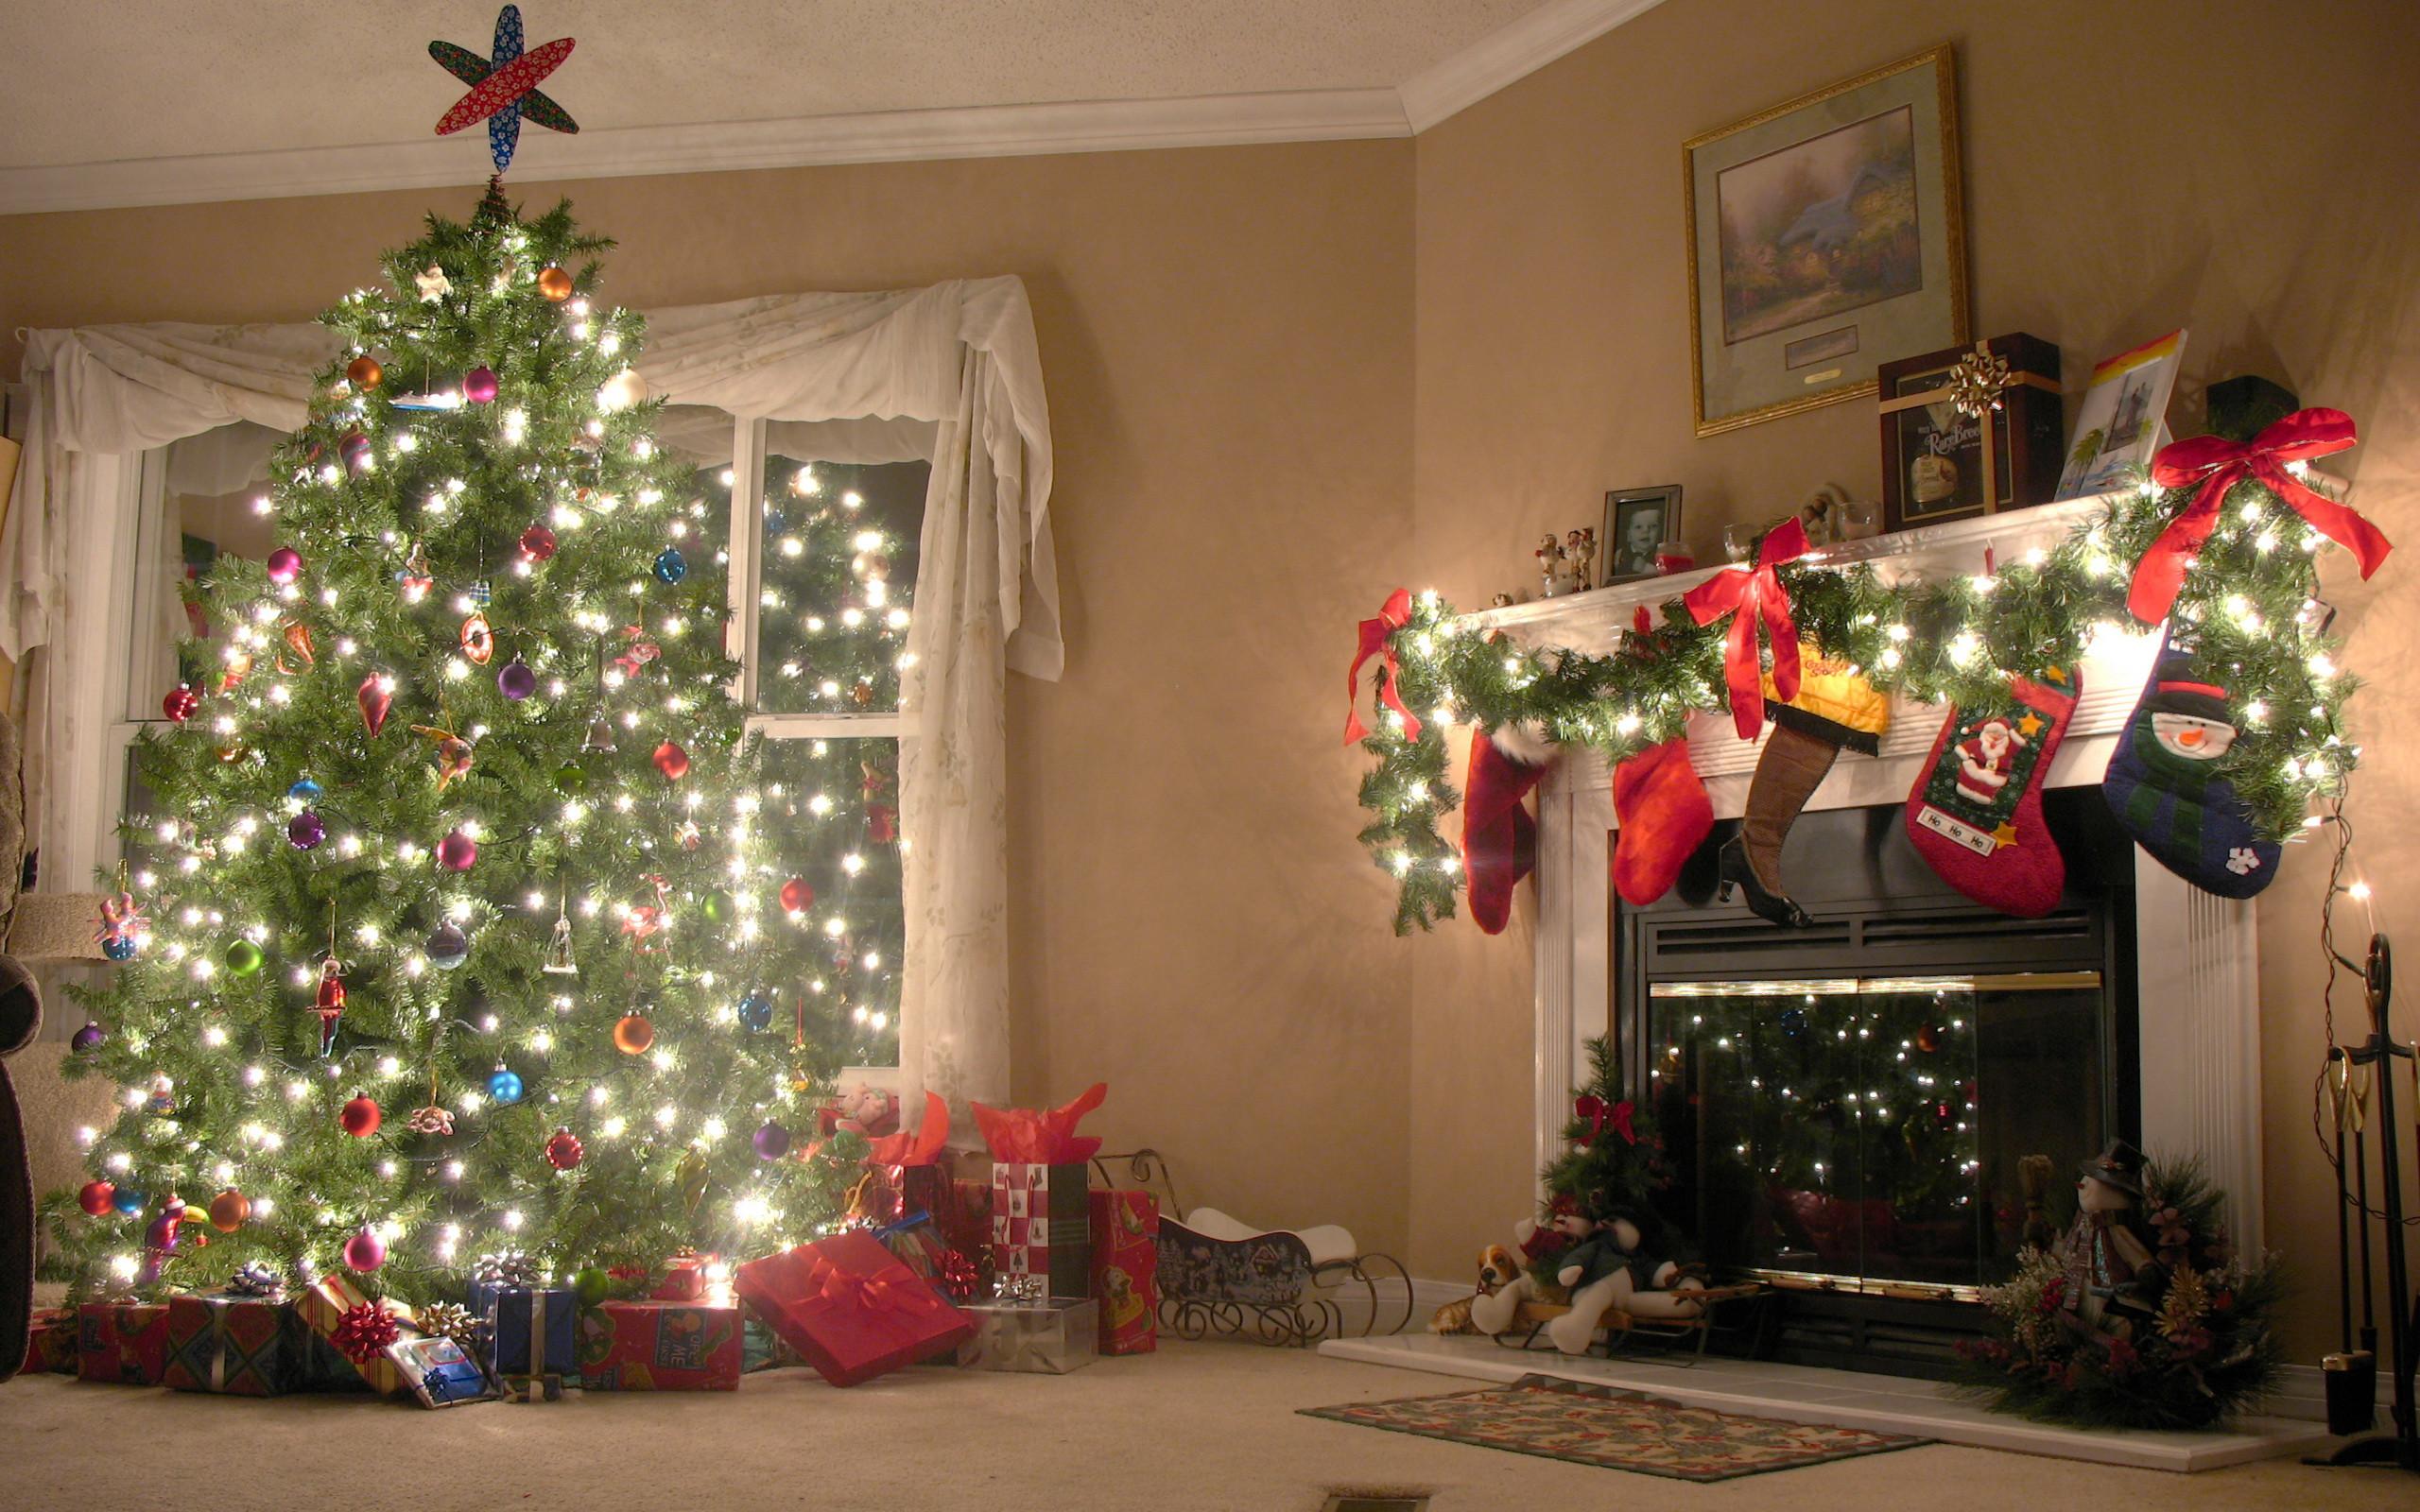 Christmas Wallpaper Fireplace  12 Christmas Fireplace s Ideas